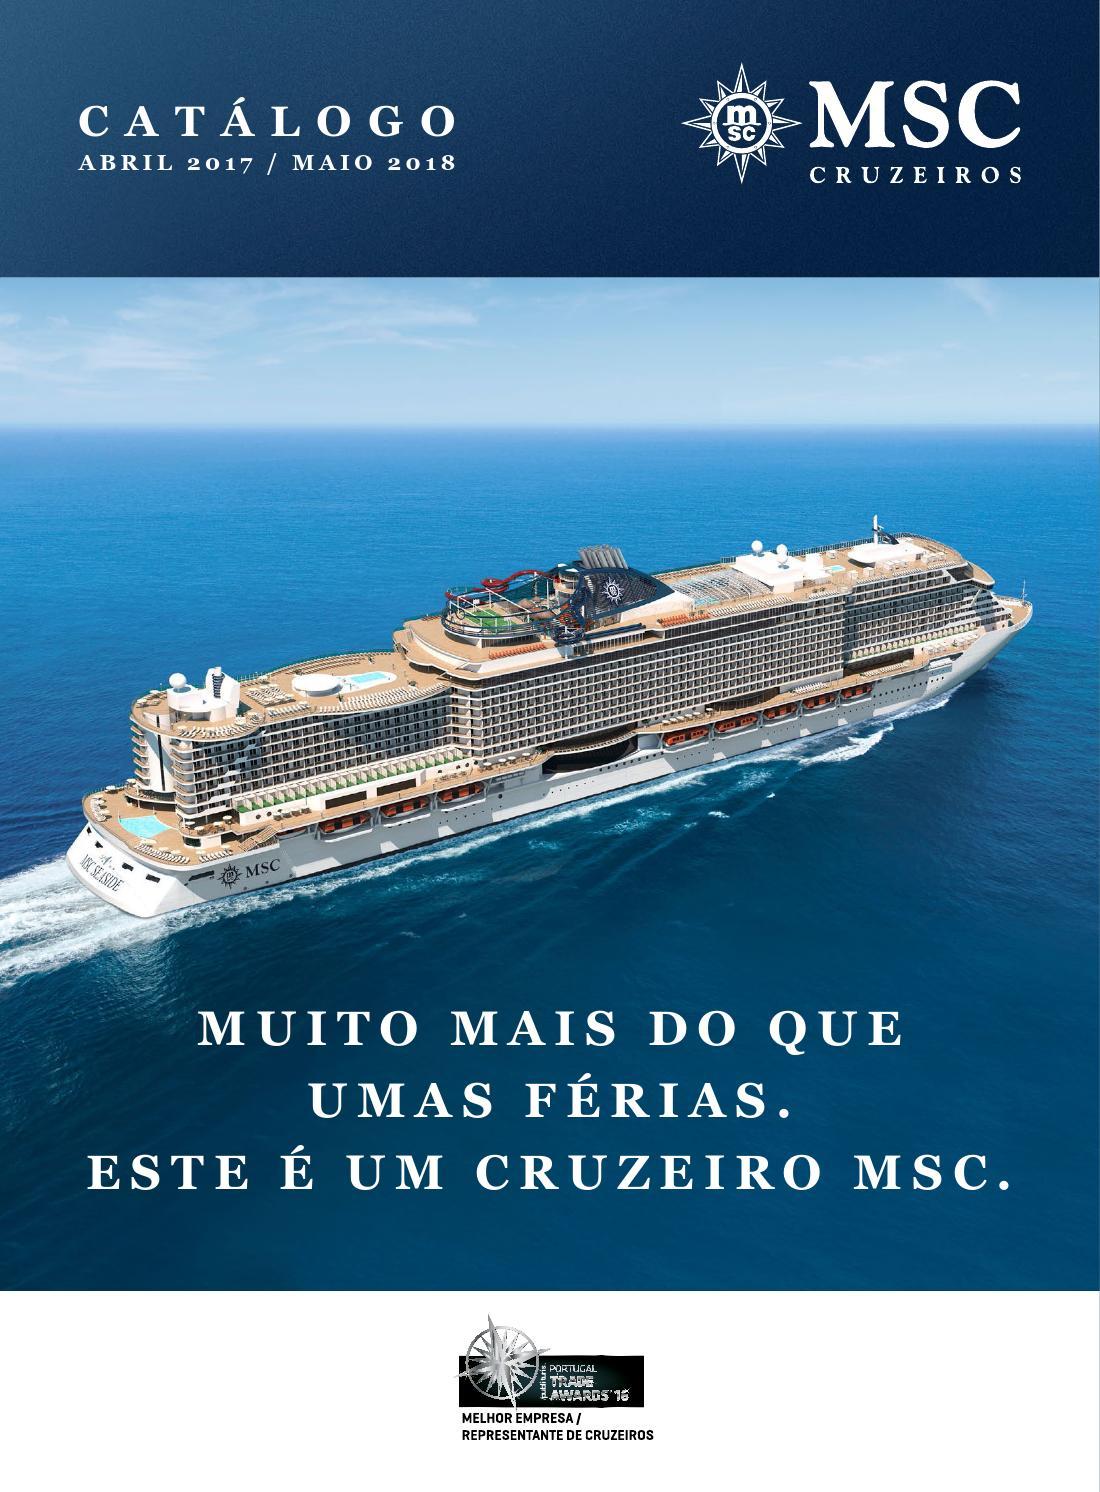 Casinos Lisboa bebe 33411